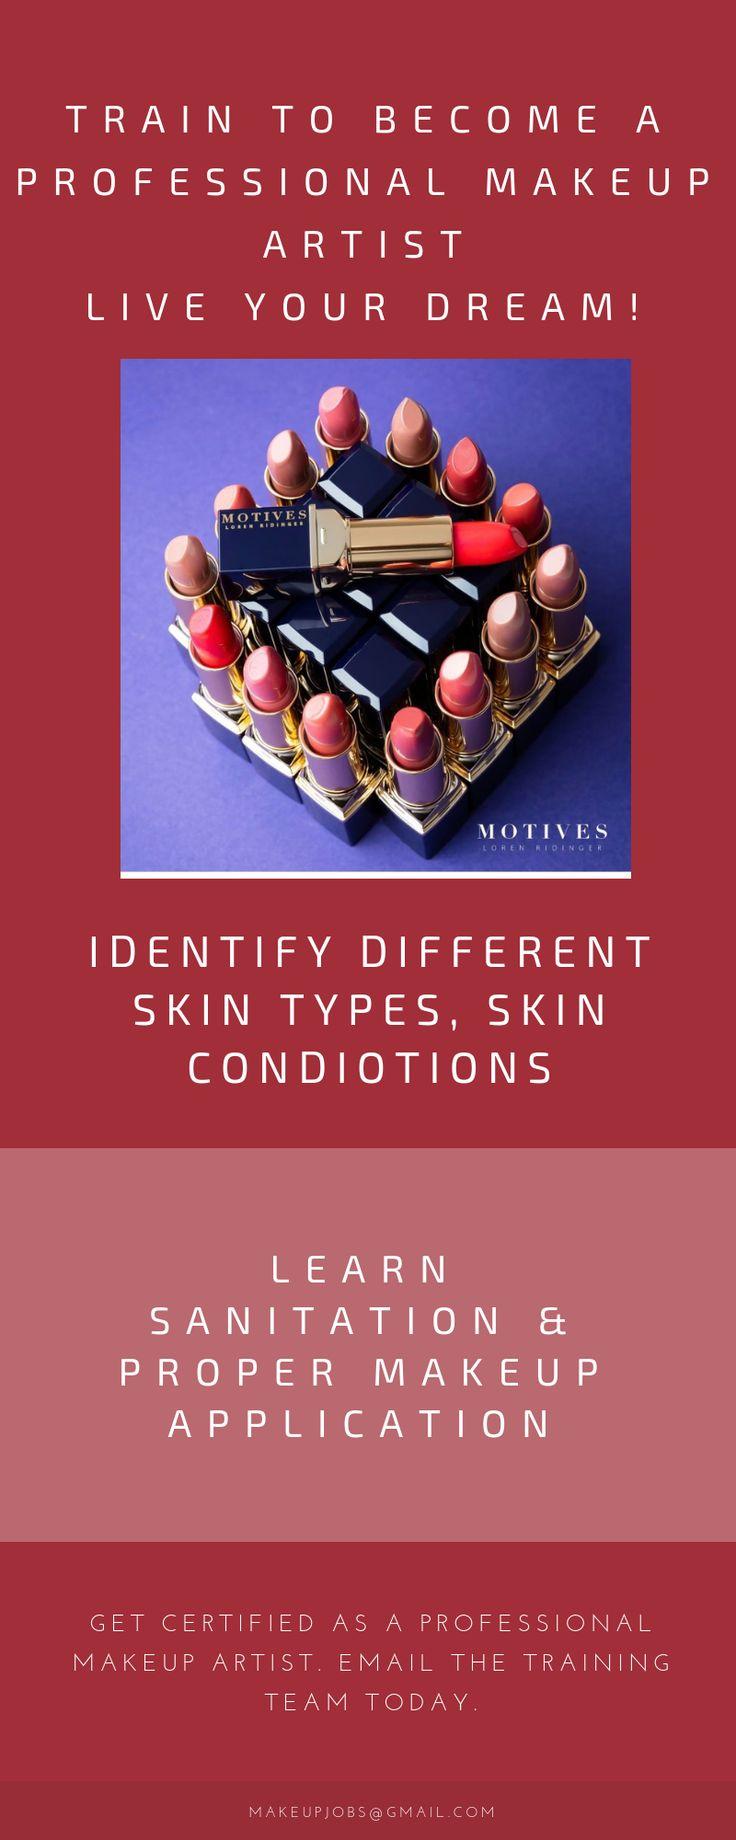 a professional makeup artist certified makeup